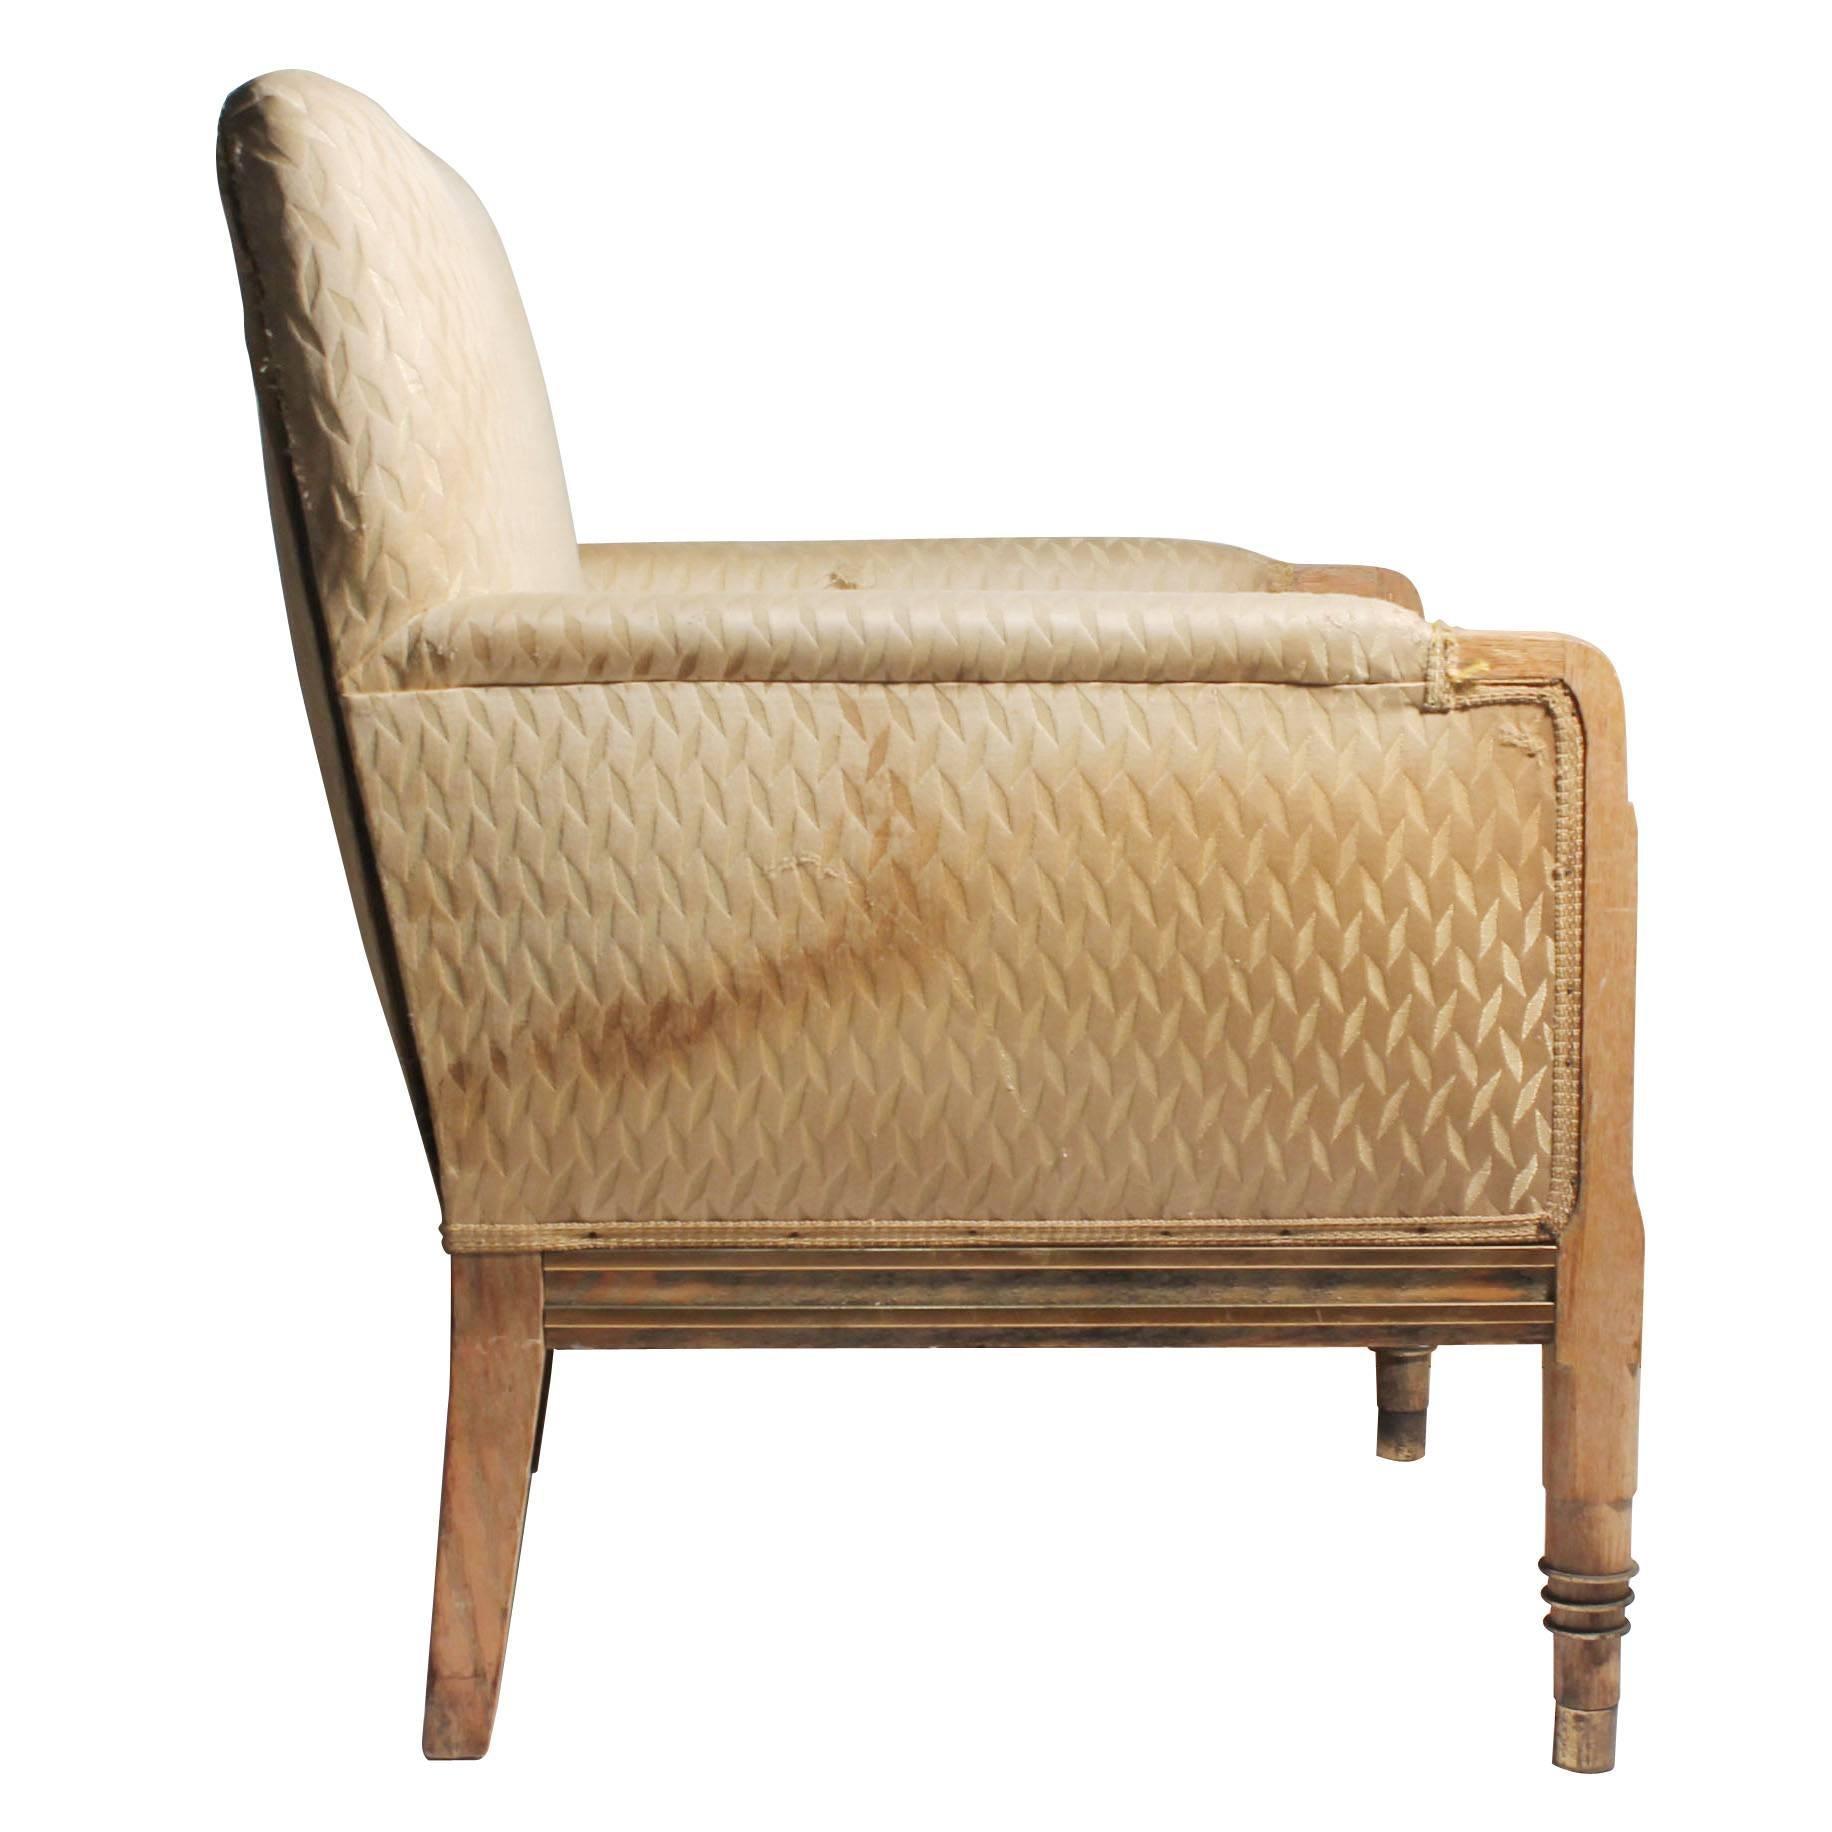 Vintage French / American Deco Club Chair